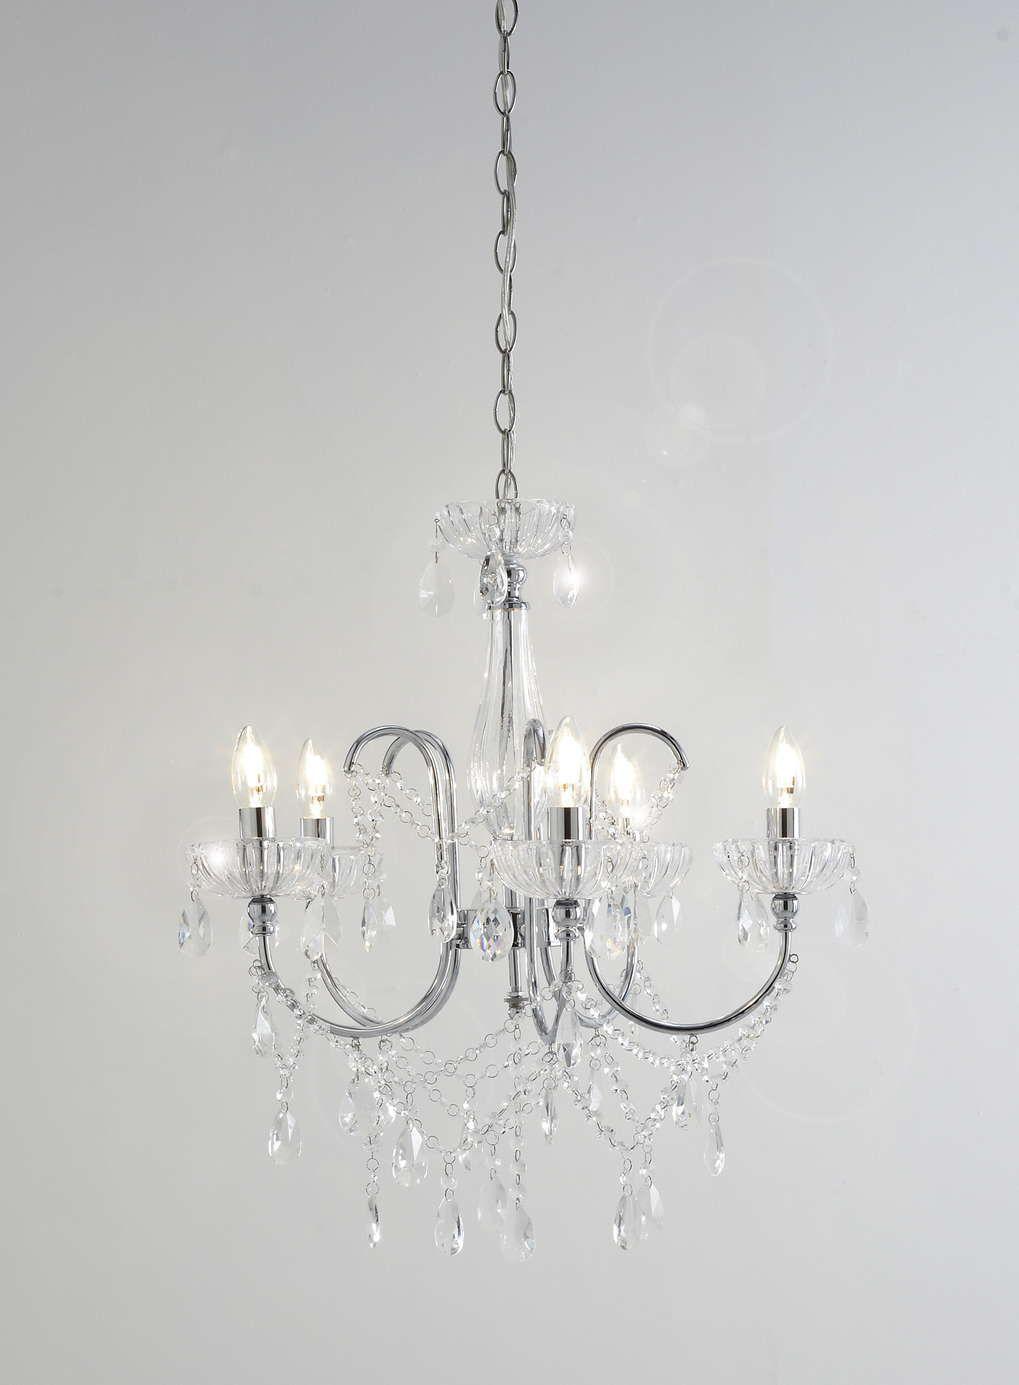 Photo 2 of edith chandelier lighting pinterest photos photo 2 of edith chandelier aloadofball Images